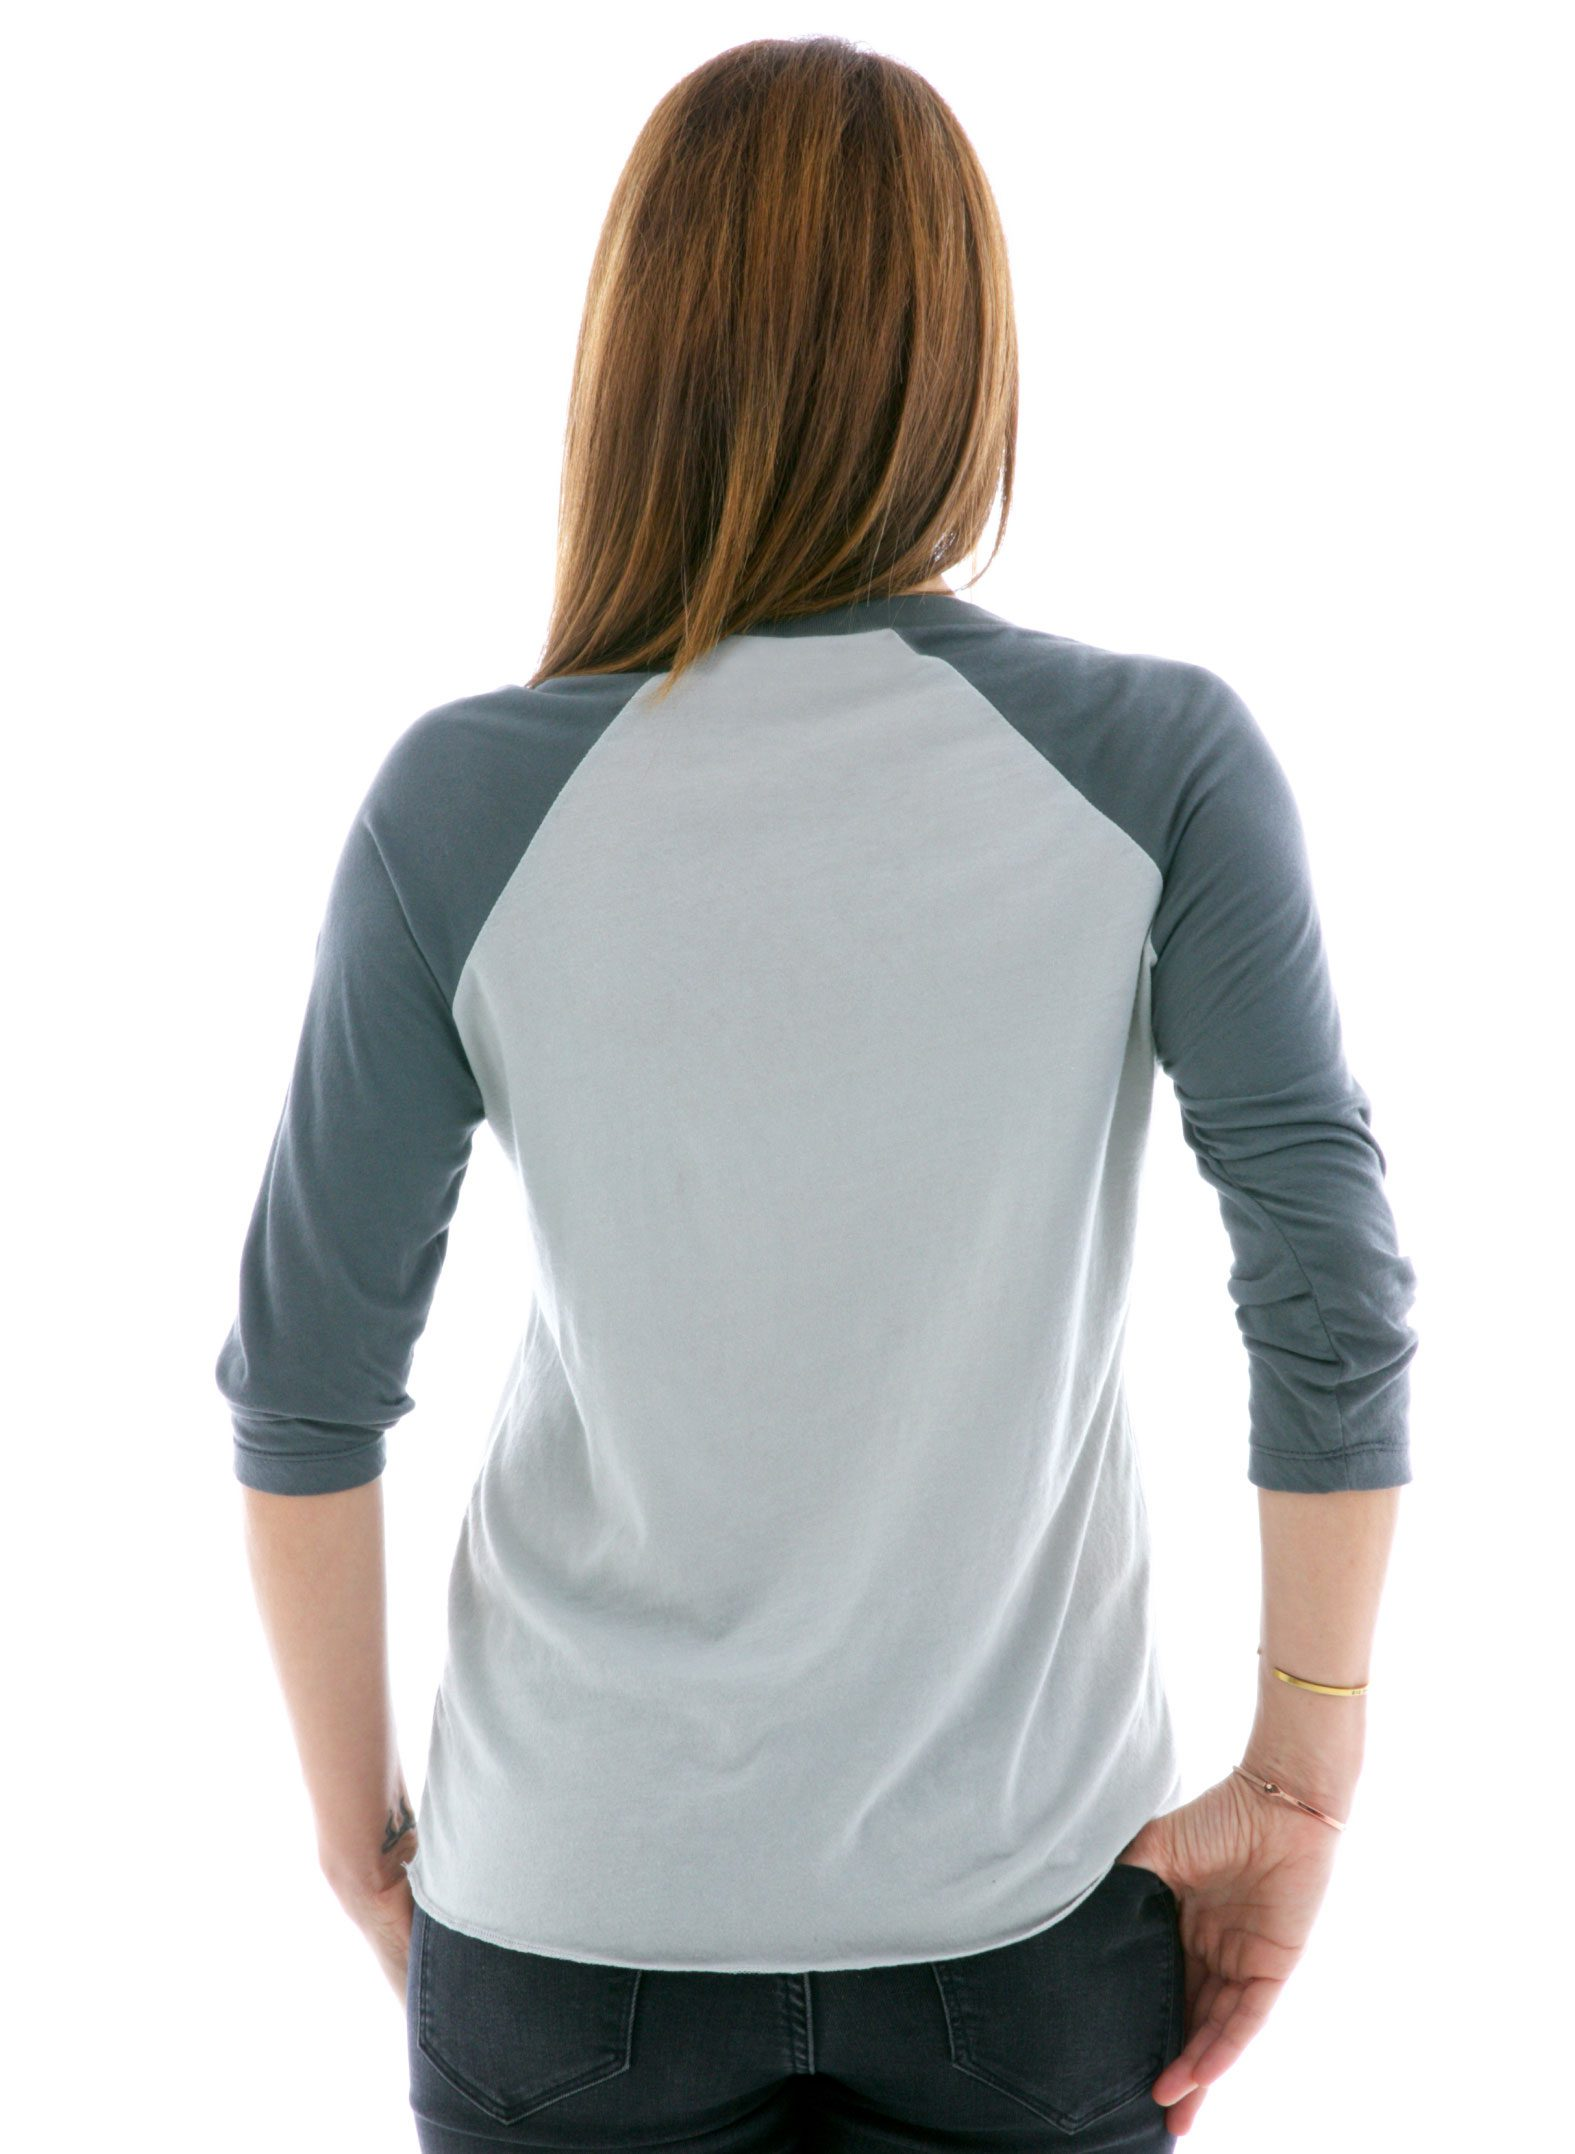 Long Sleeve Raglan Jersey Back View